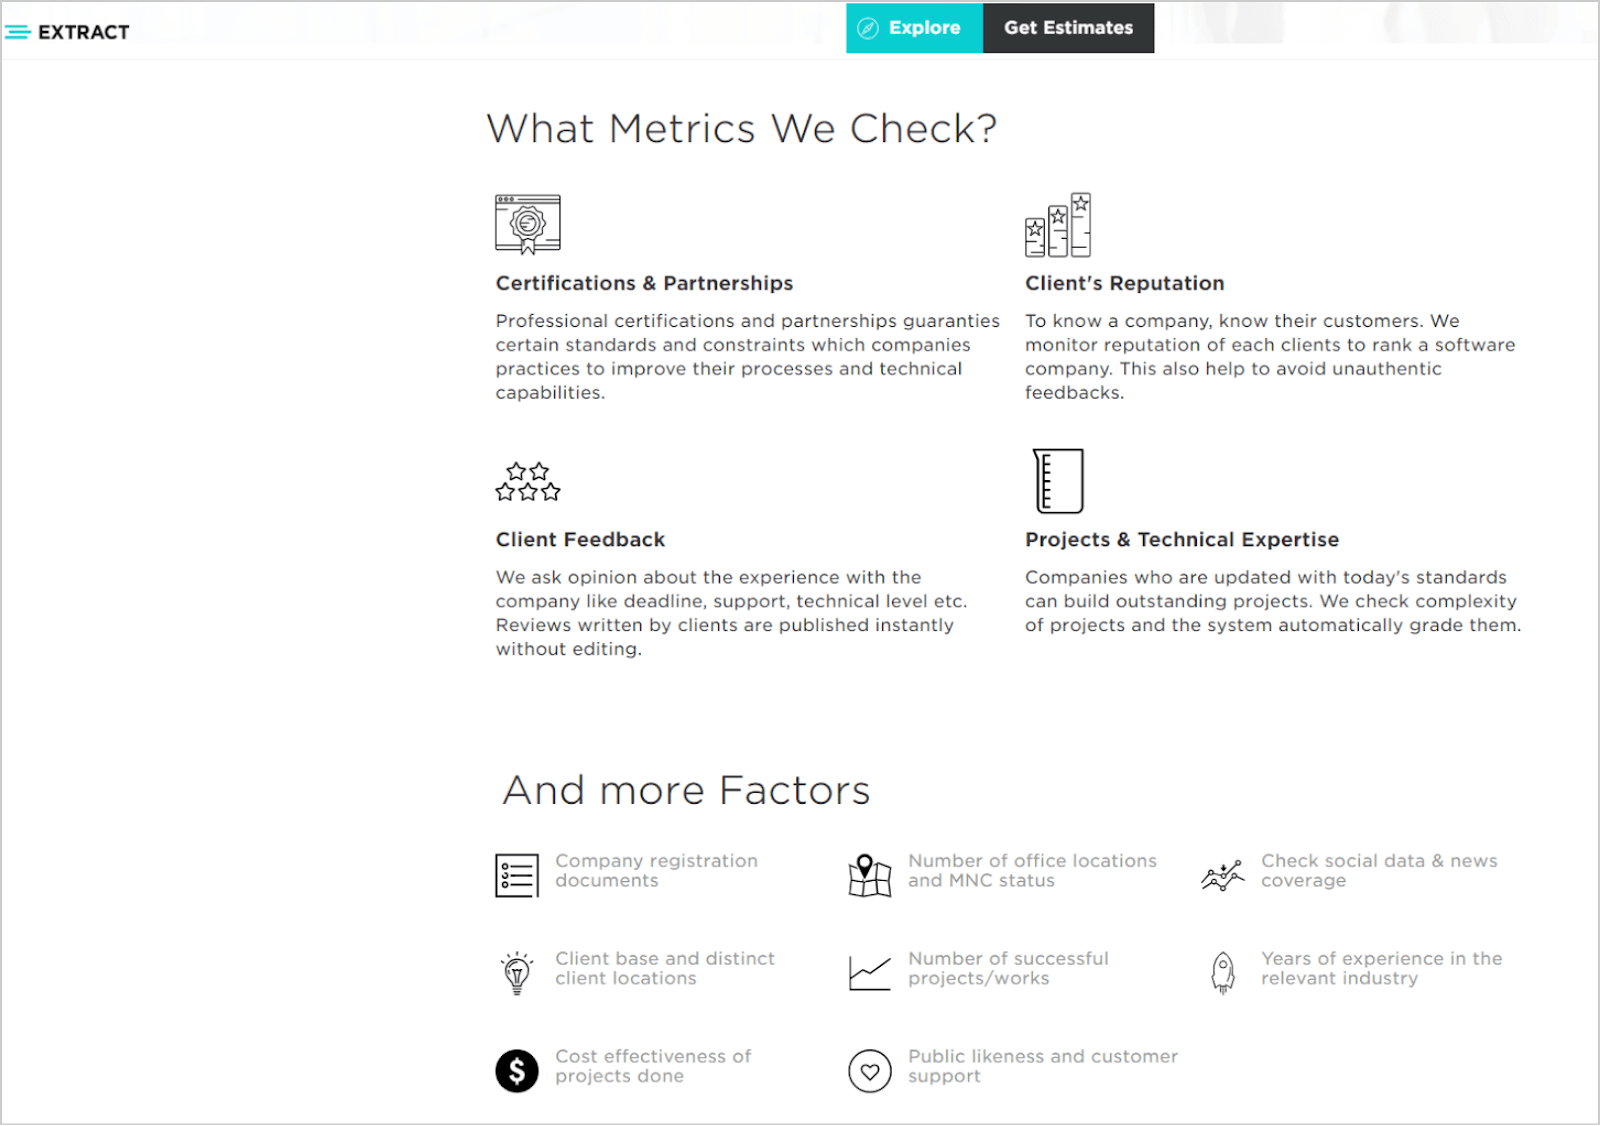 Extract - what metrics we check?